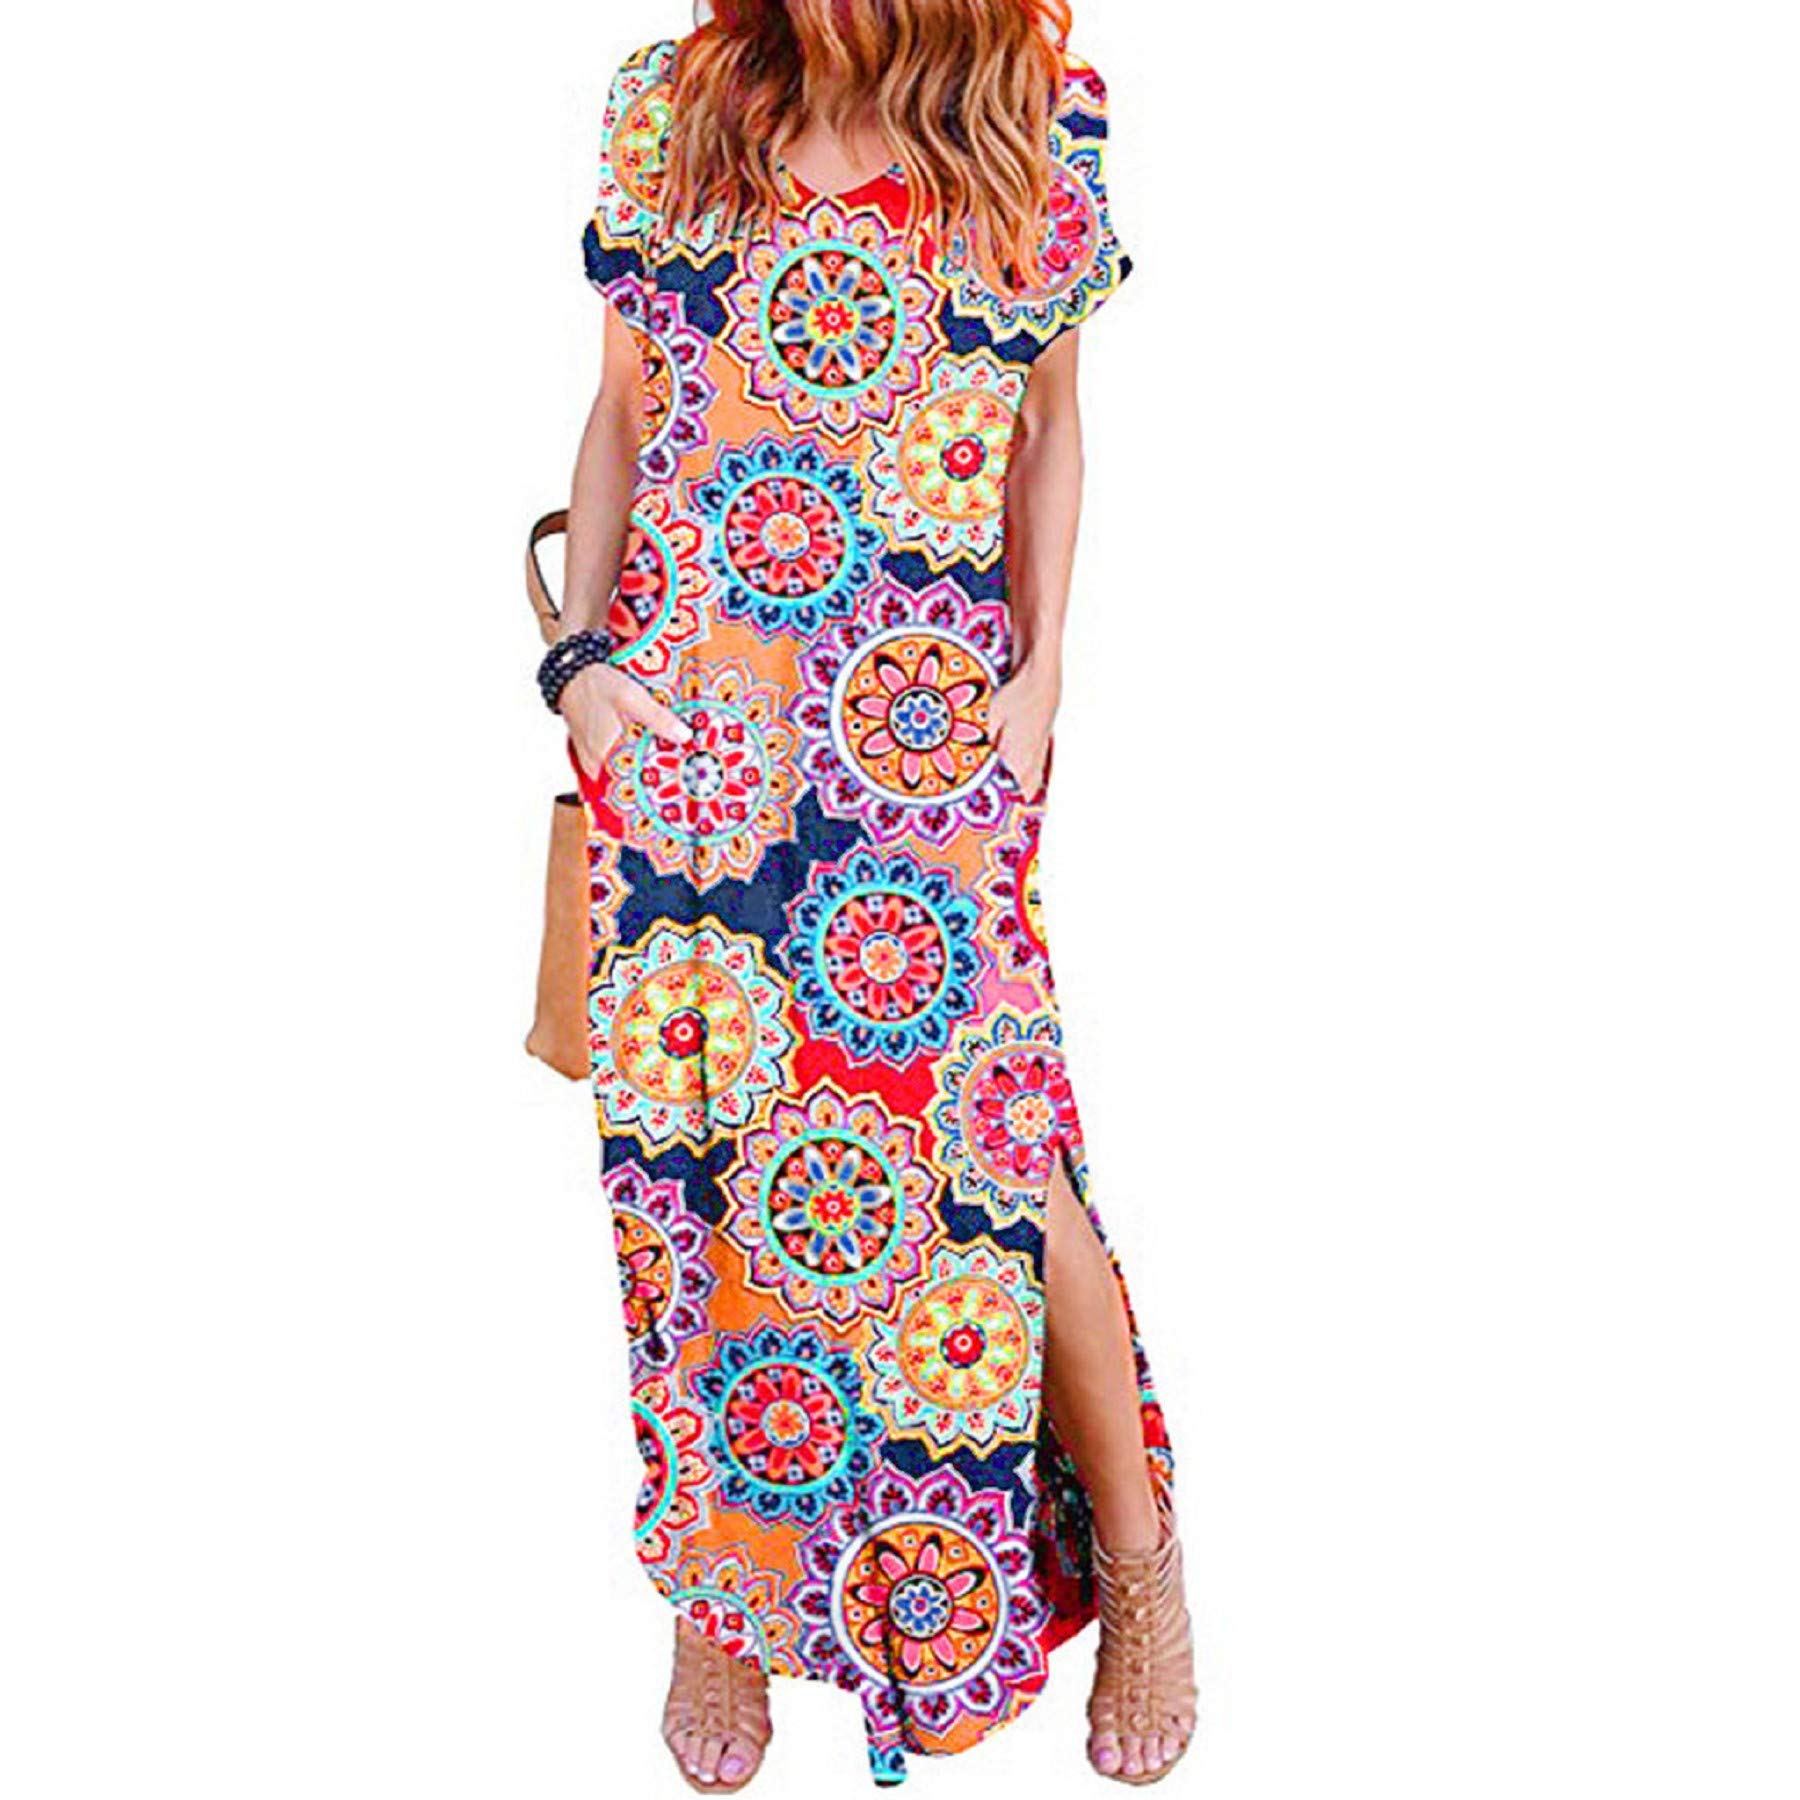 Women's Beach Dress Casual Loose Pocket Long Dress Short Sleeve Split Maxi Dresses (XL, Red) by Leedford (Image #1)